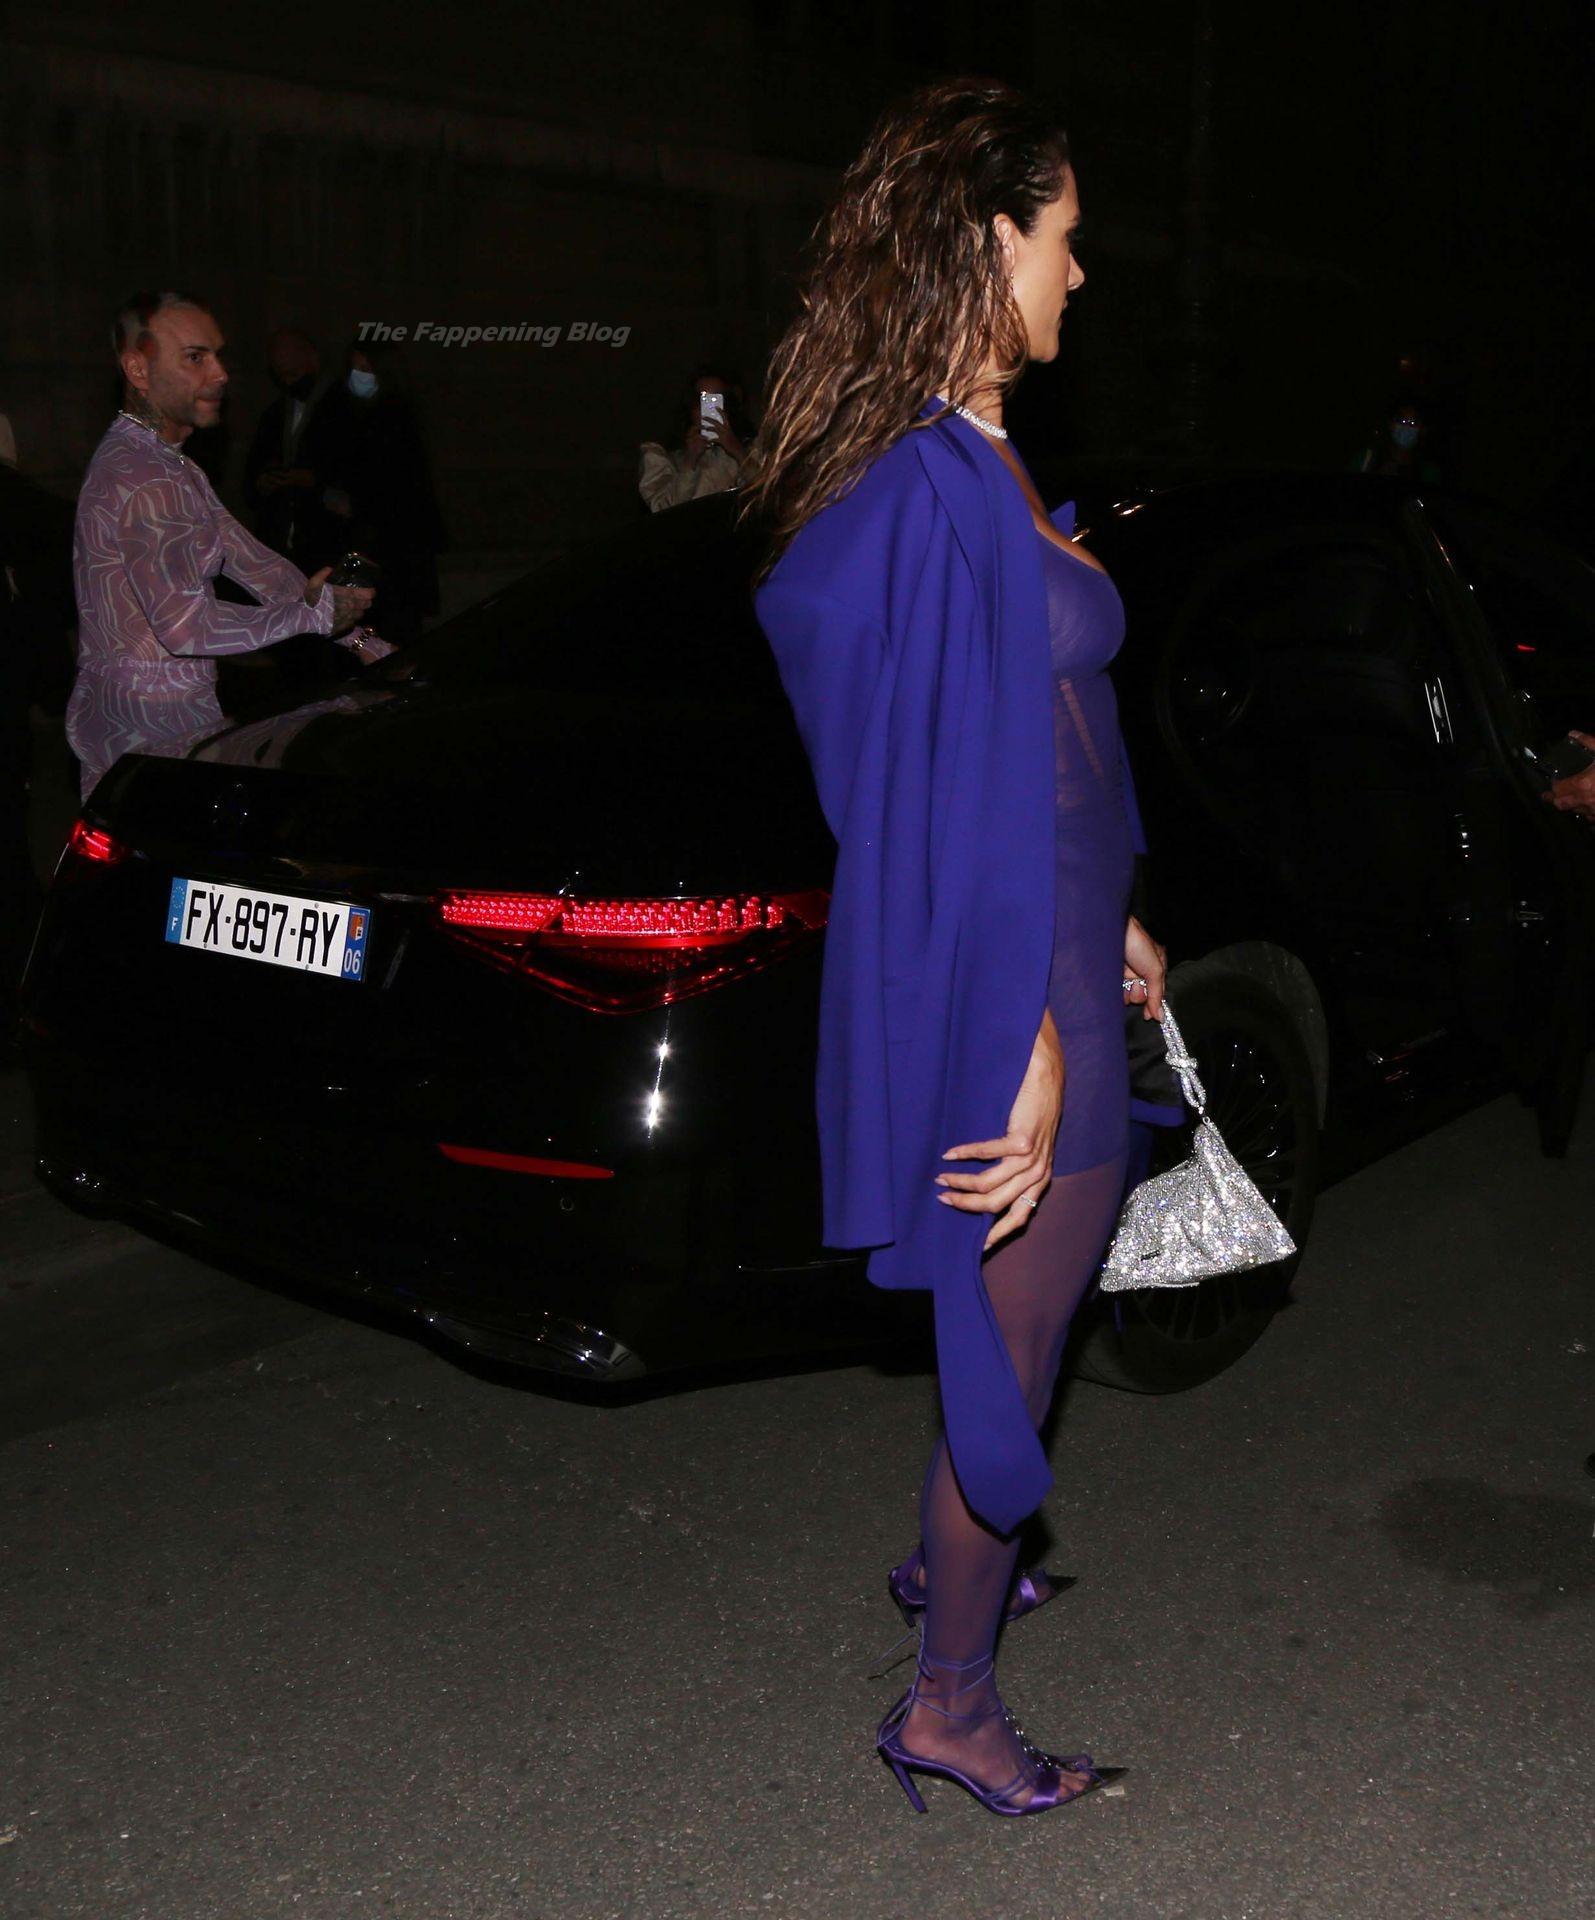 Alessandra-Ambrosio-Sexy-The-Fappening-Blog-42-1.jpg